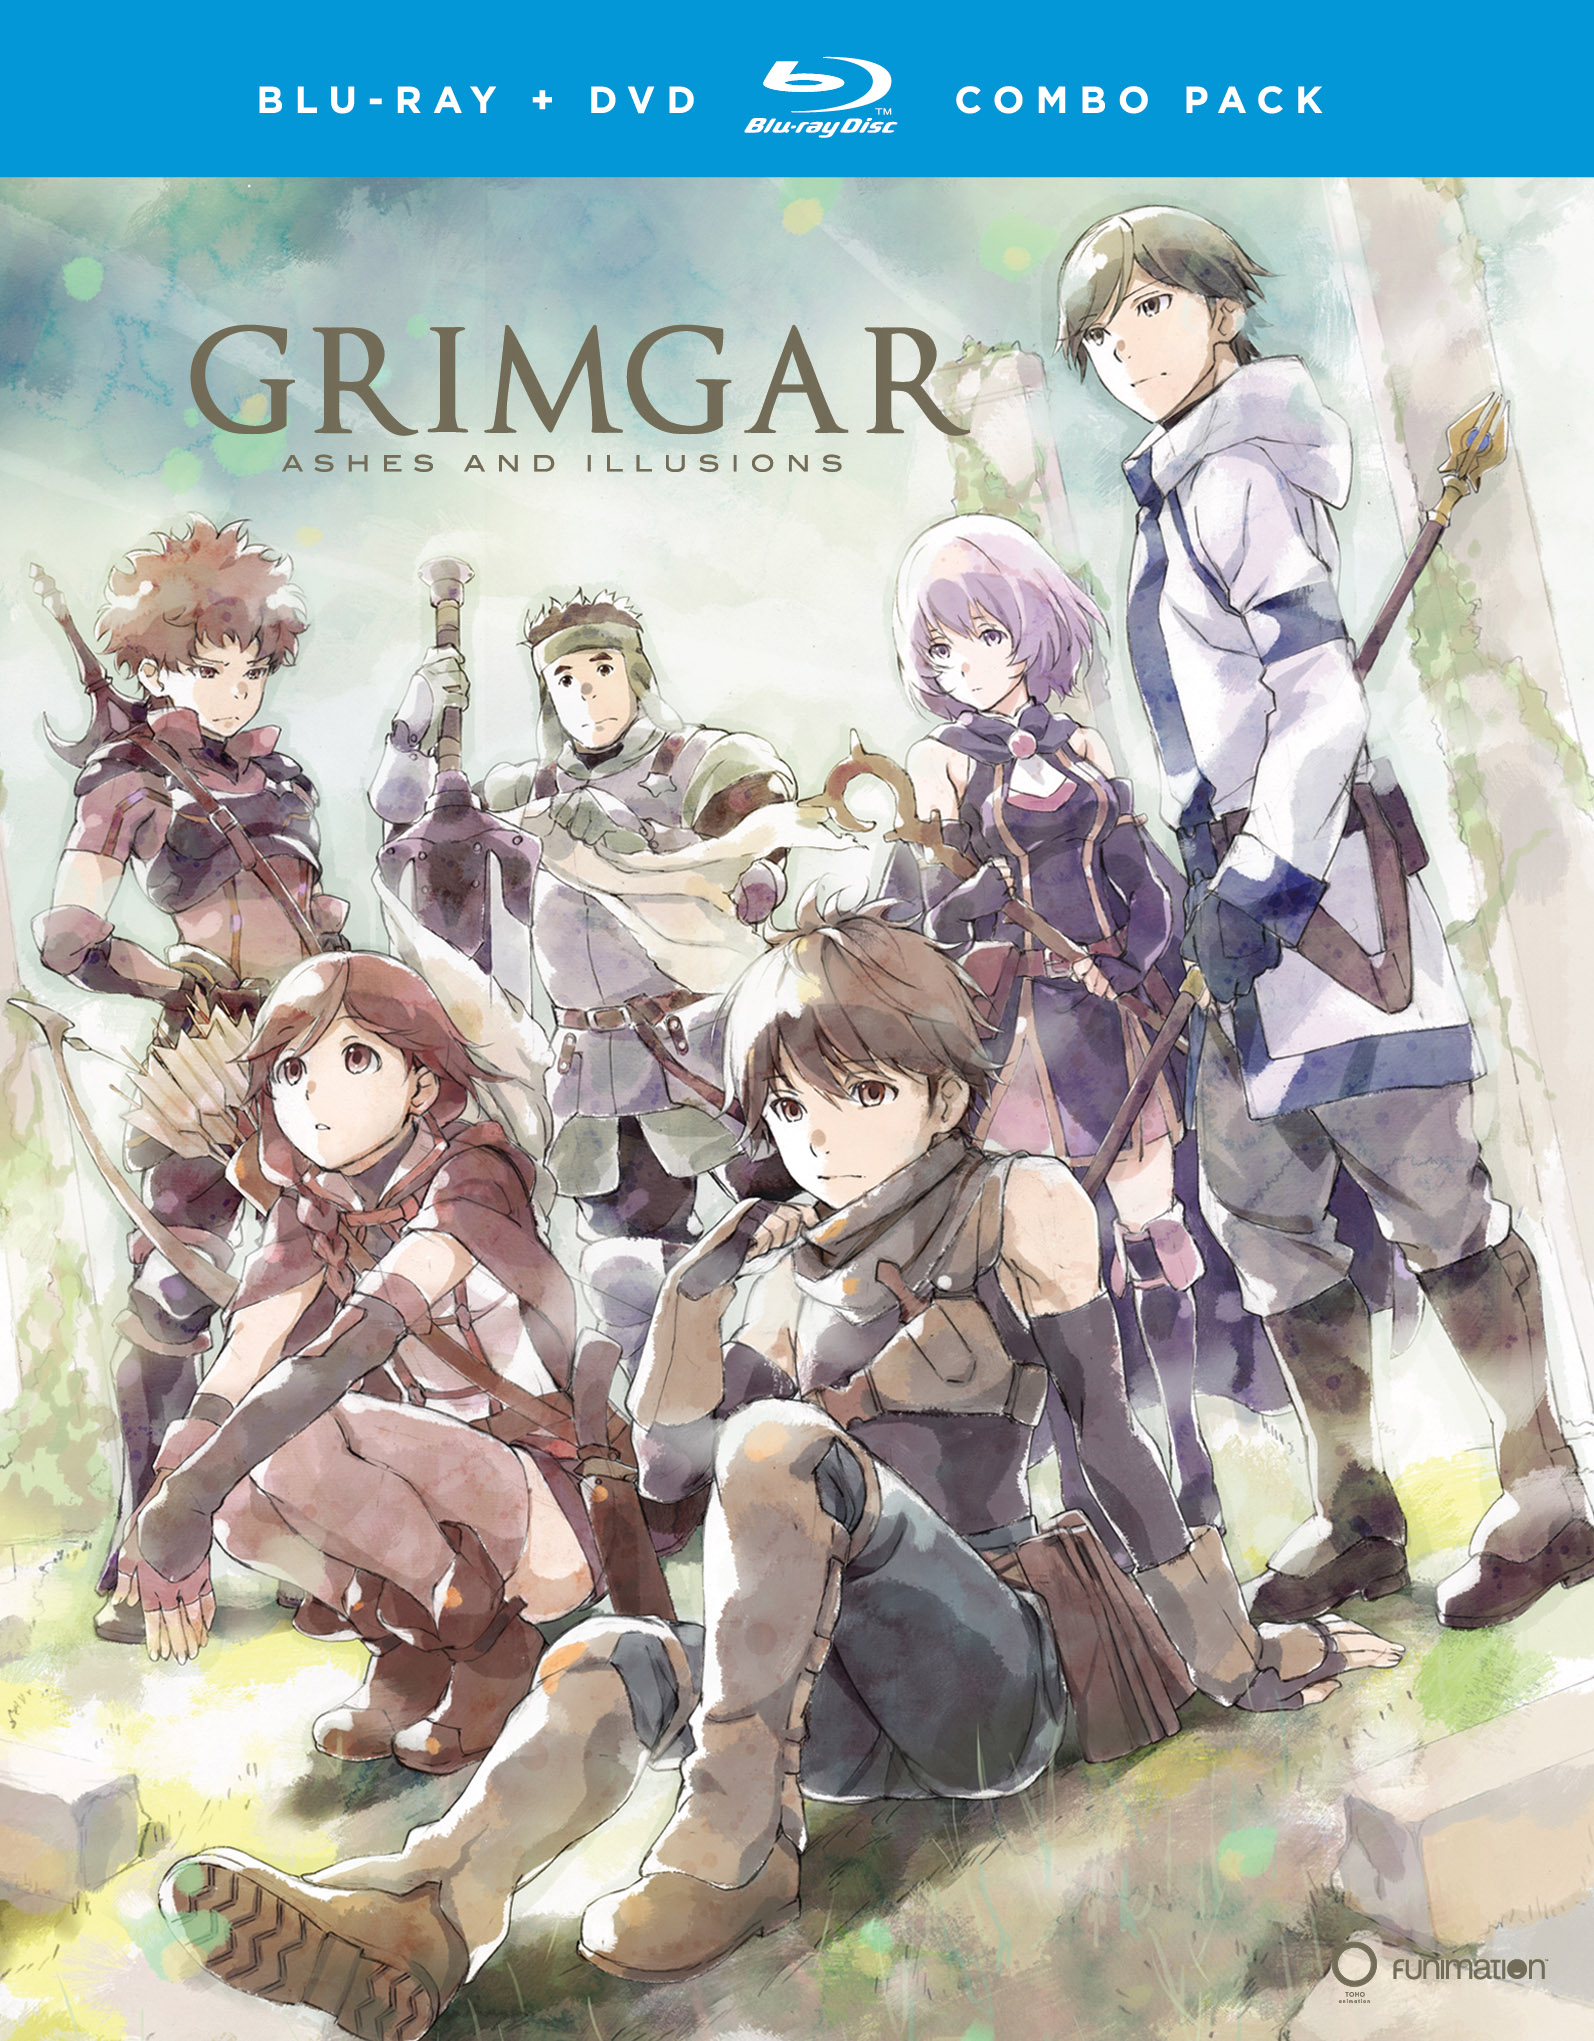 Grimgar Blu-ray/DVD